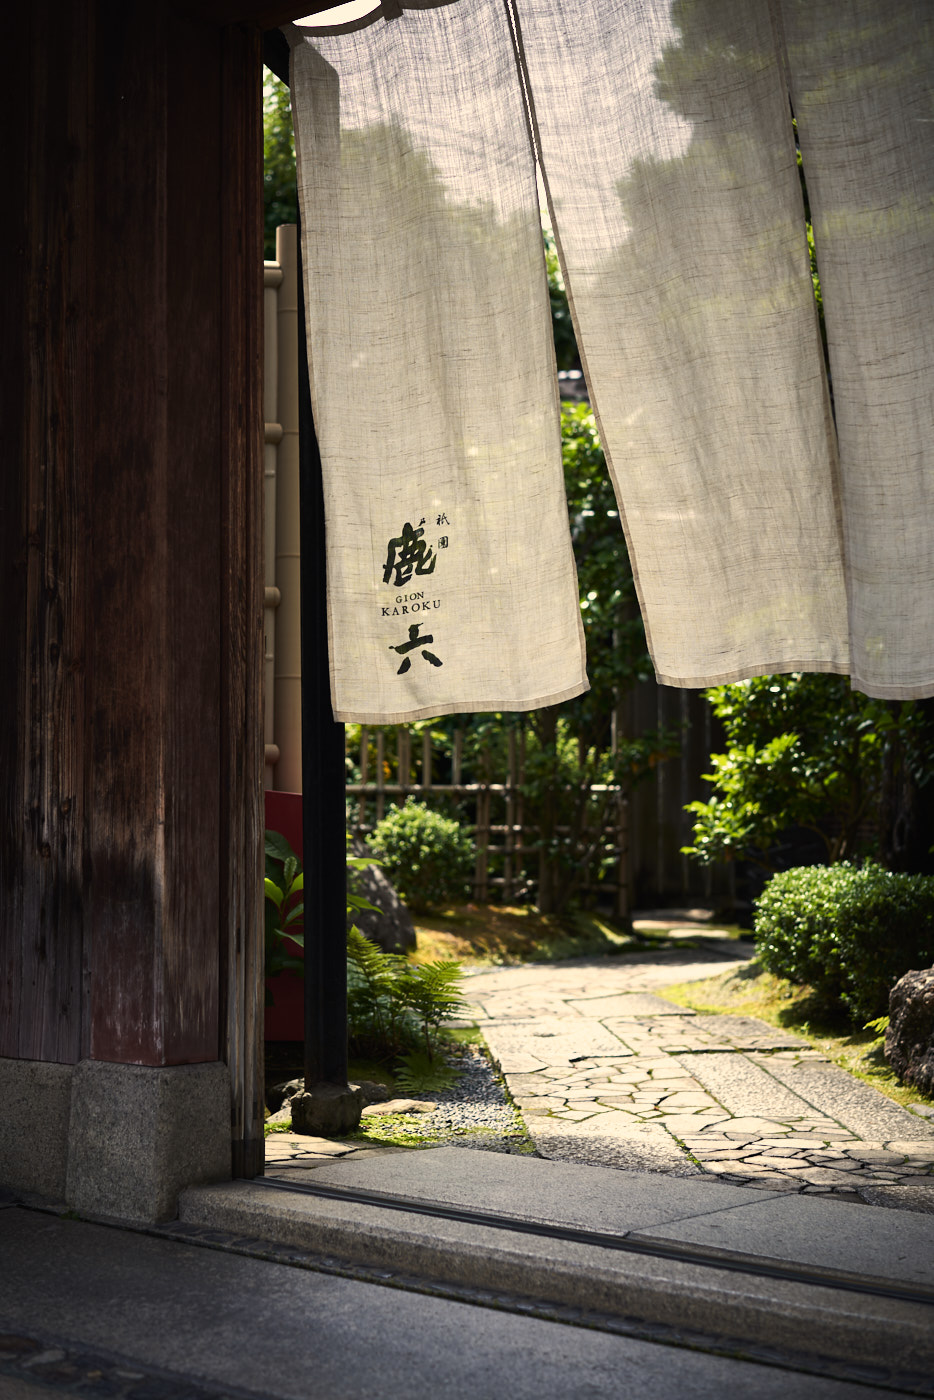 japan_2018_kyoto_raw 60_klein.jpg